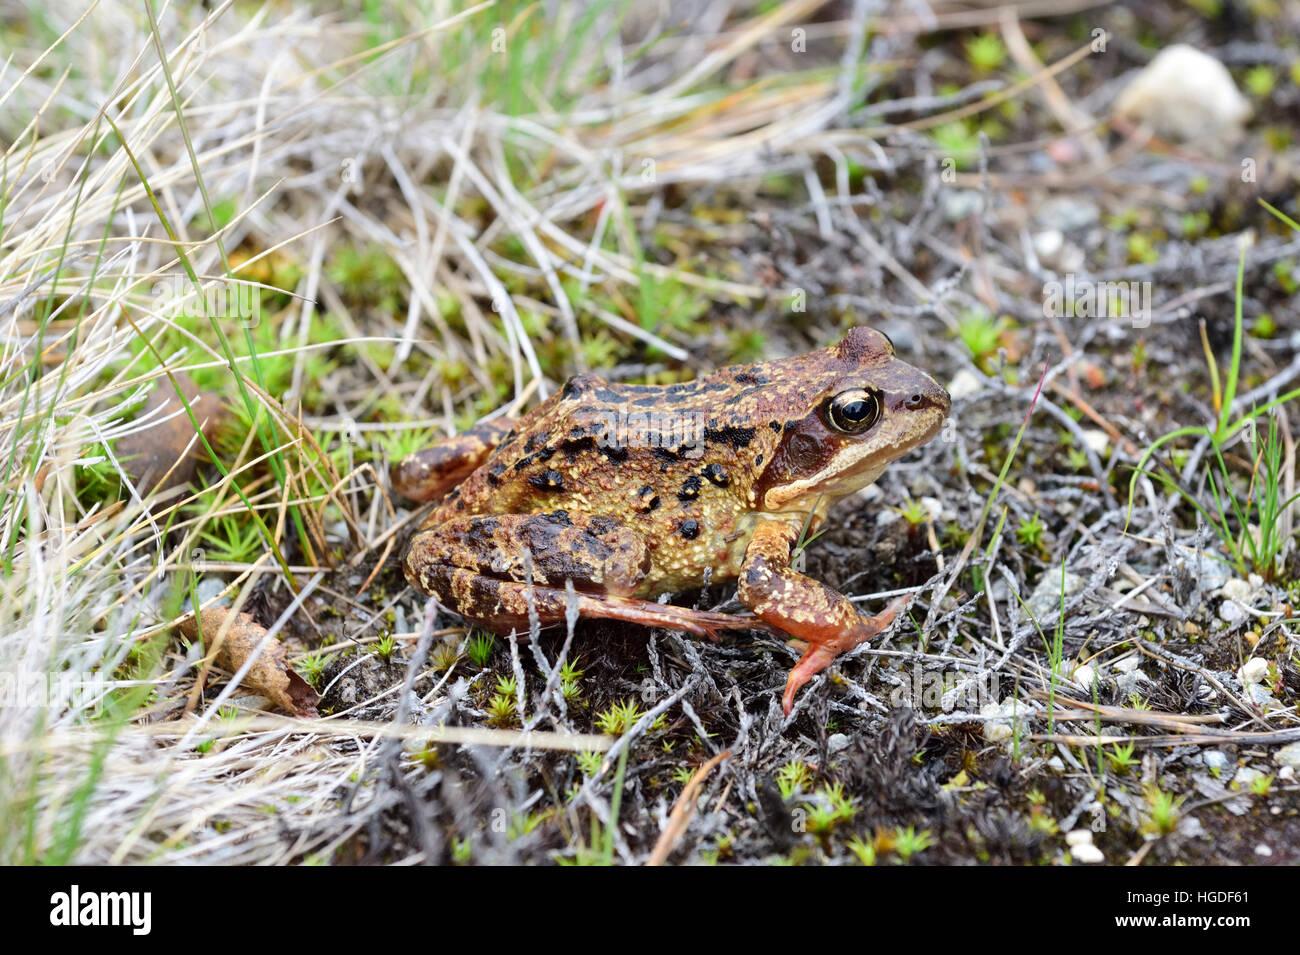 Common Frog, Rana temporaria, - Stock Image